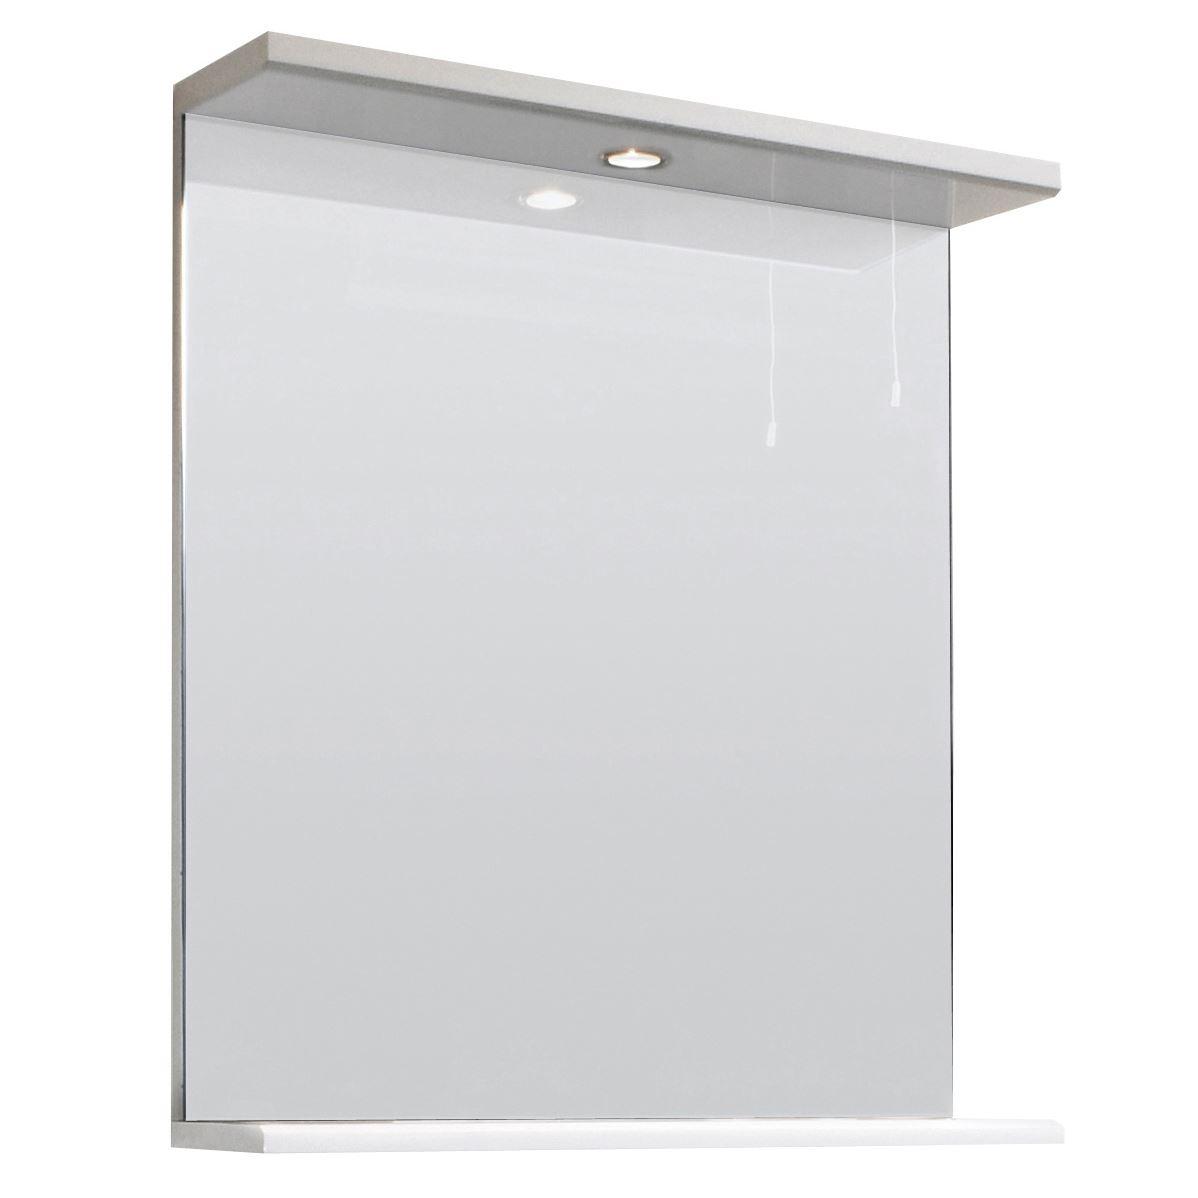 high gloss white illuminated bathroom mirror bath vanity cabinet light